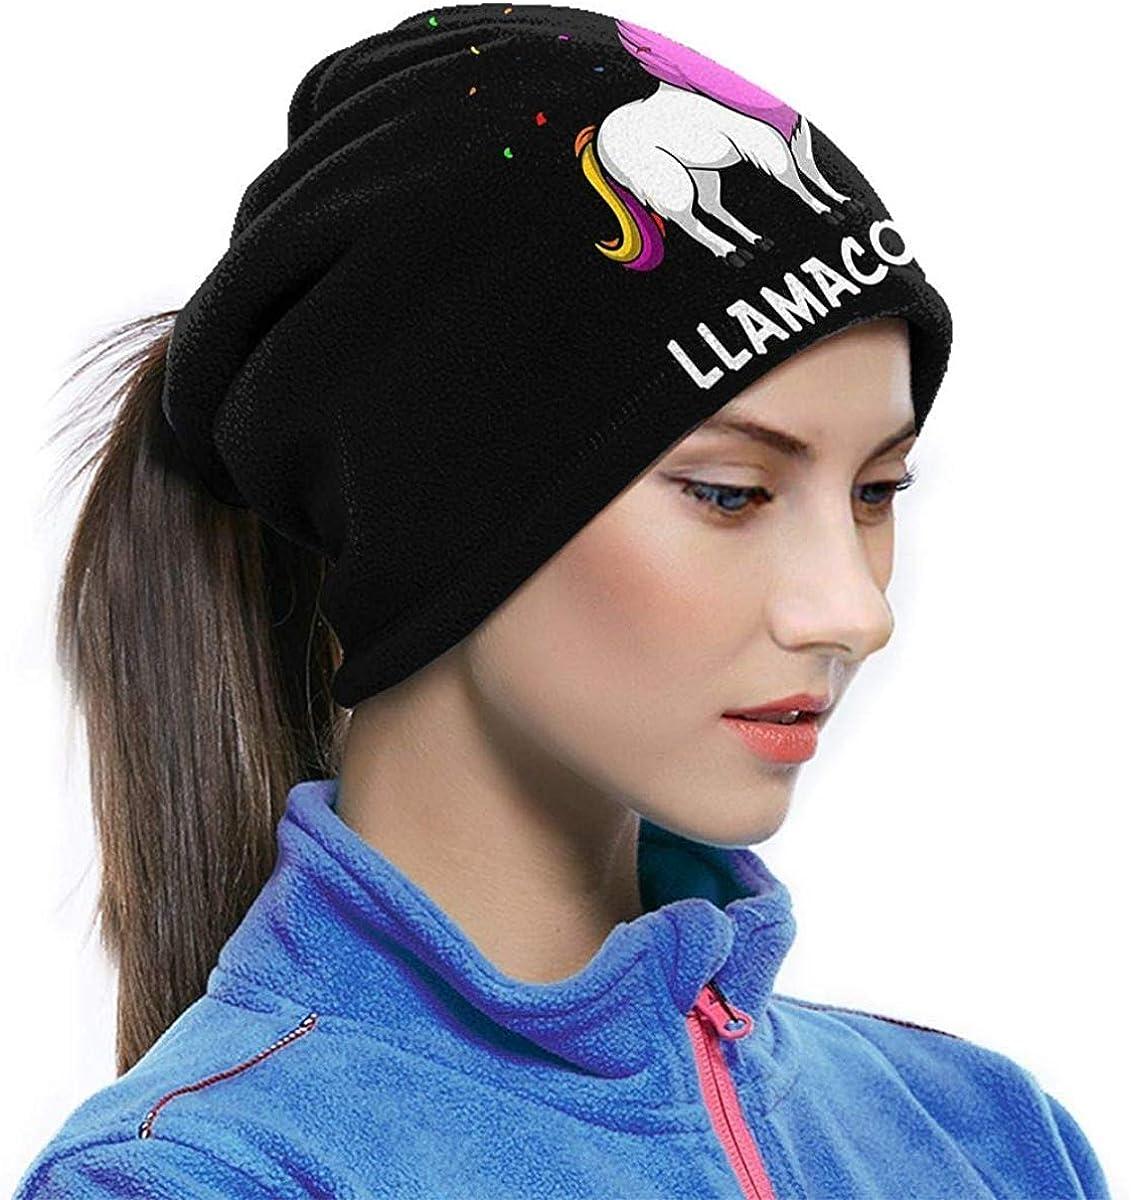 Llama Unicorn Microfiber Neck Warmer Balaclavas Soft Fleece Headwear Face Scarf Mask for Winter